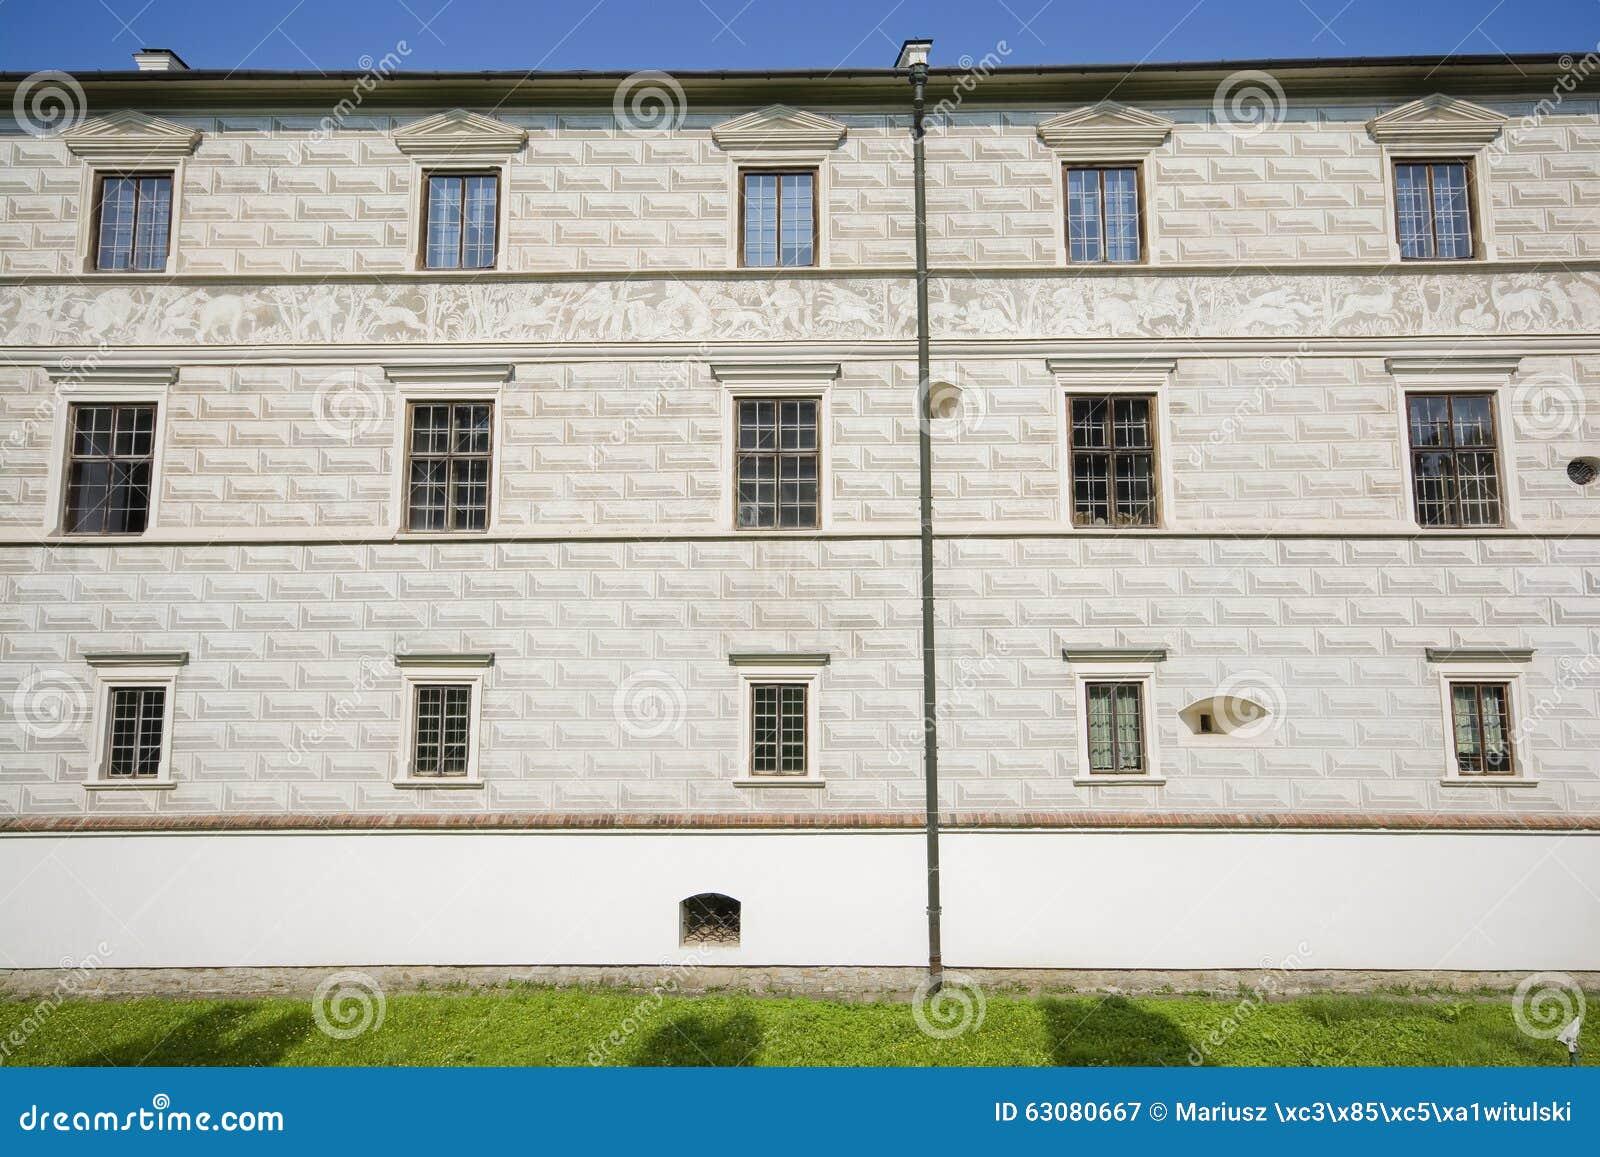 Download Château dans Krasiczyn image stock. Image du pelouse - 63080667